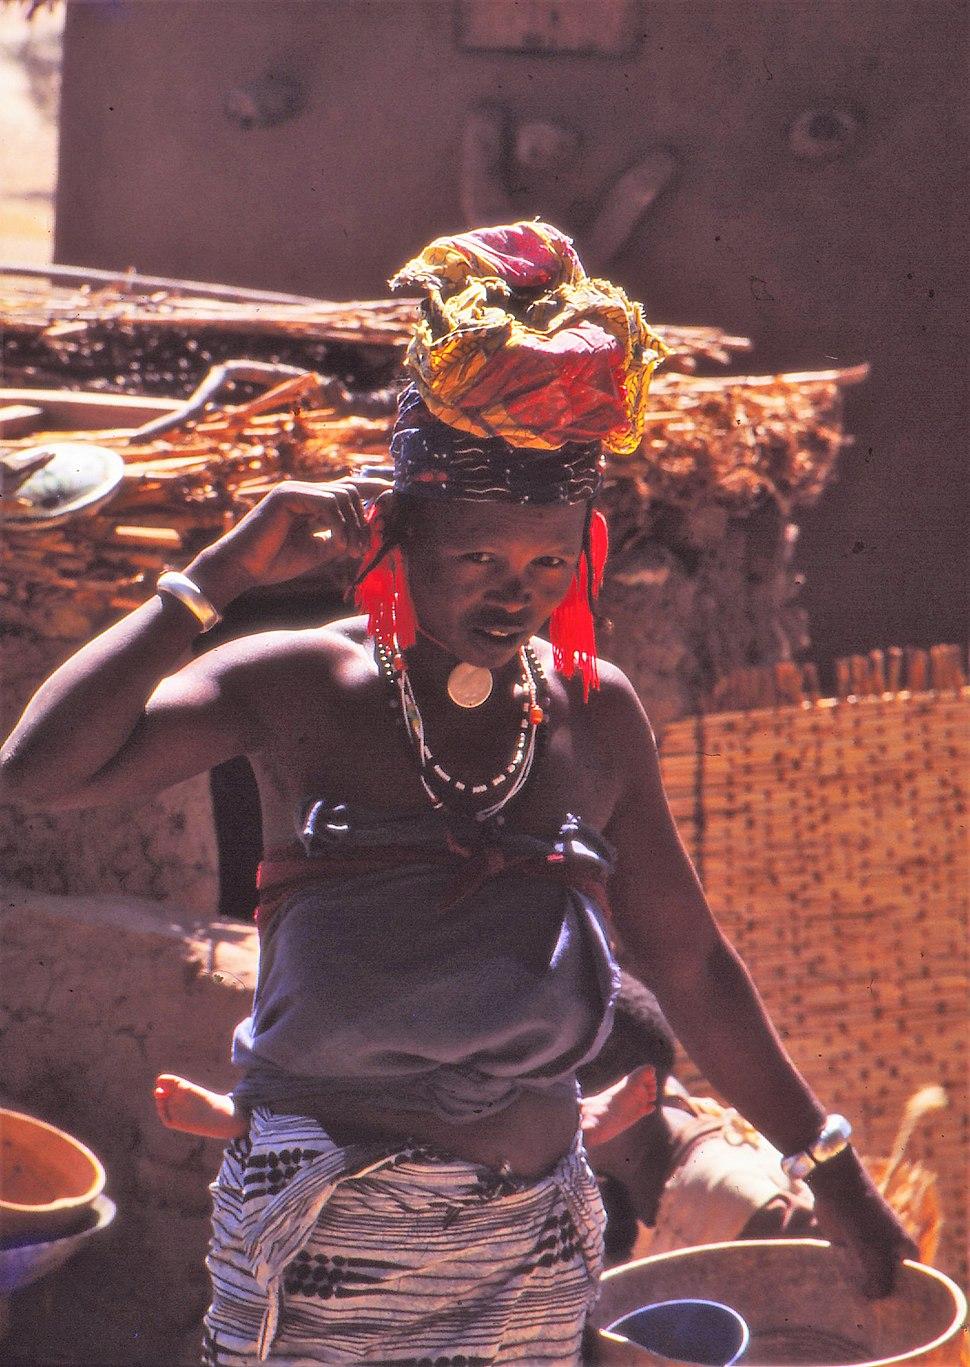 ASC Leiden - W.E.A. van Beek Collection - Dogon markets 44 - Fulbe woman at the Sangha market, Mali 1992